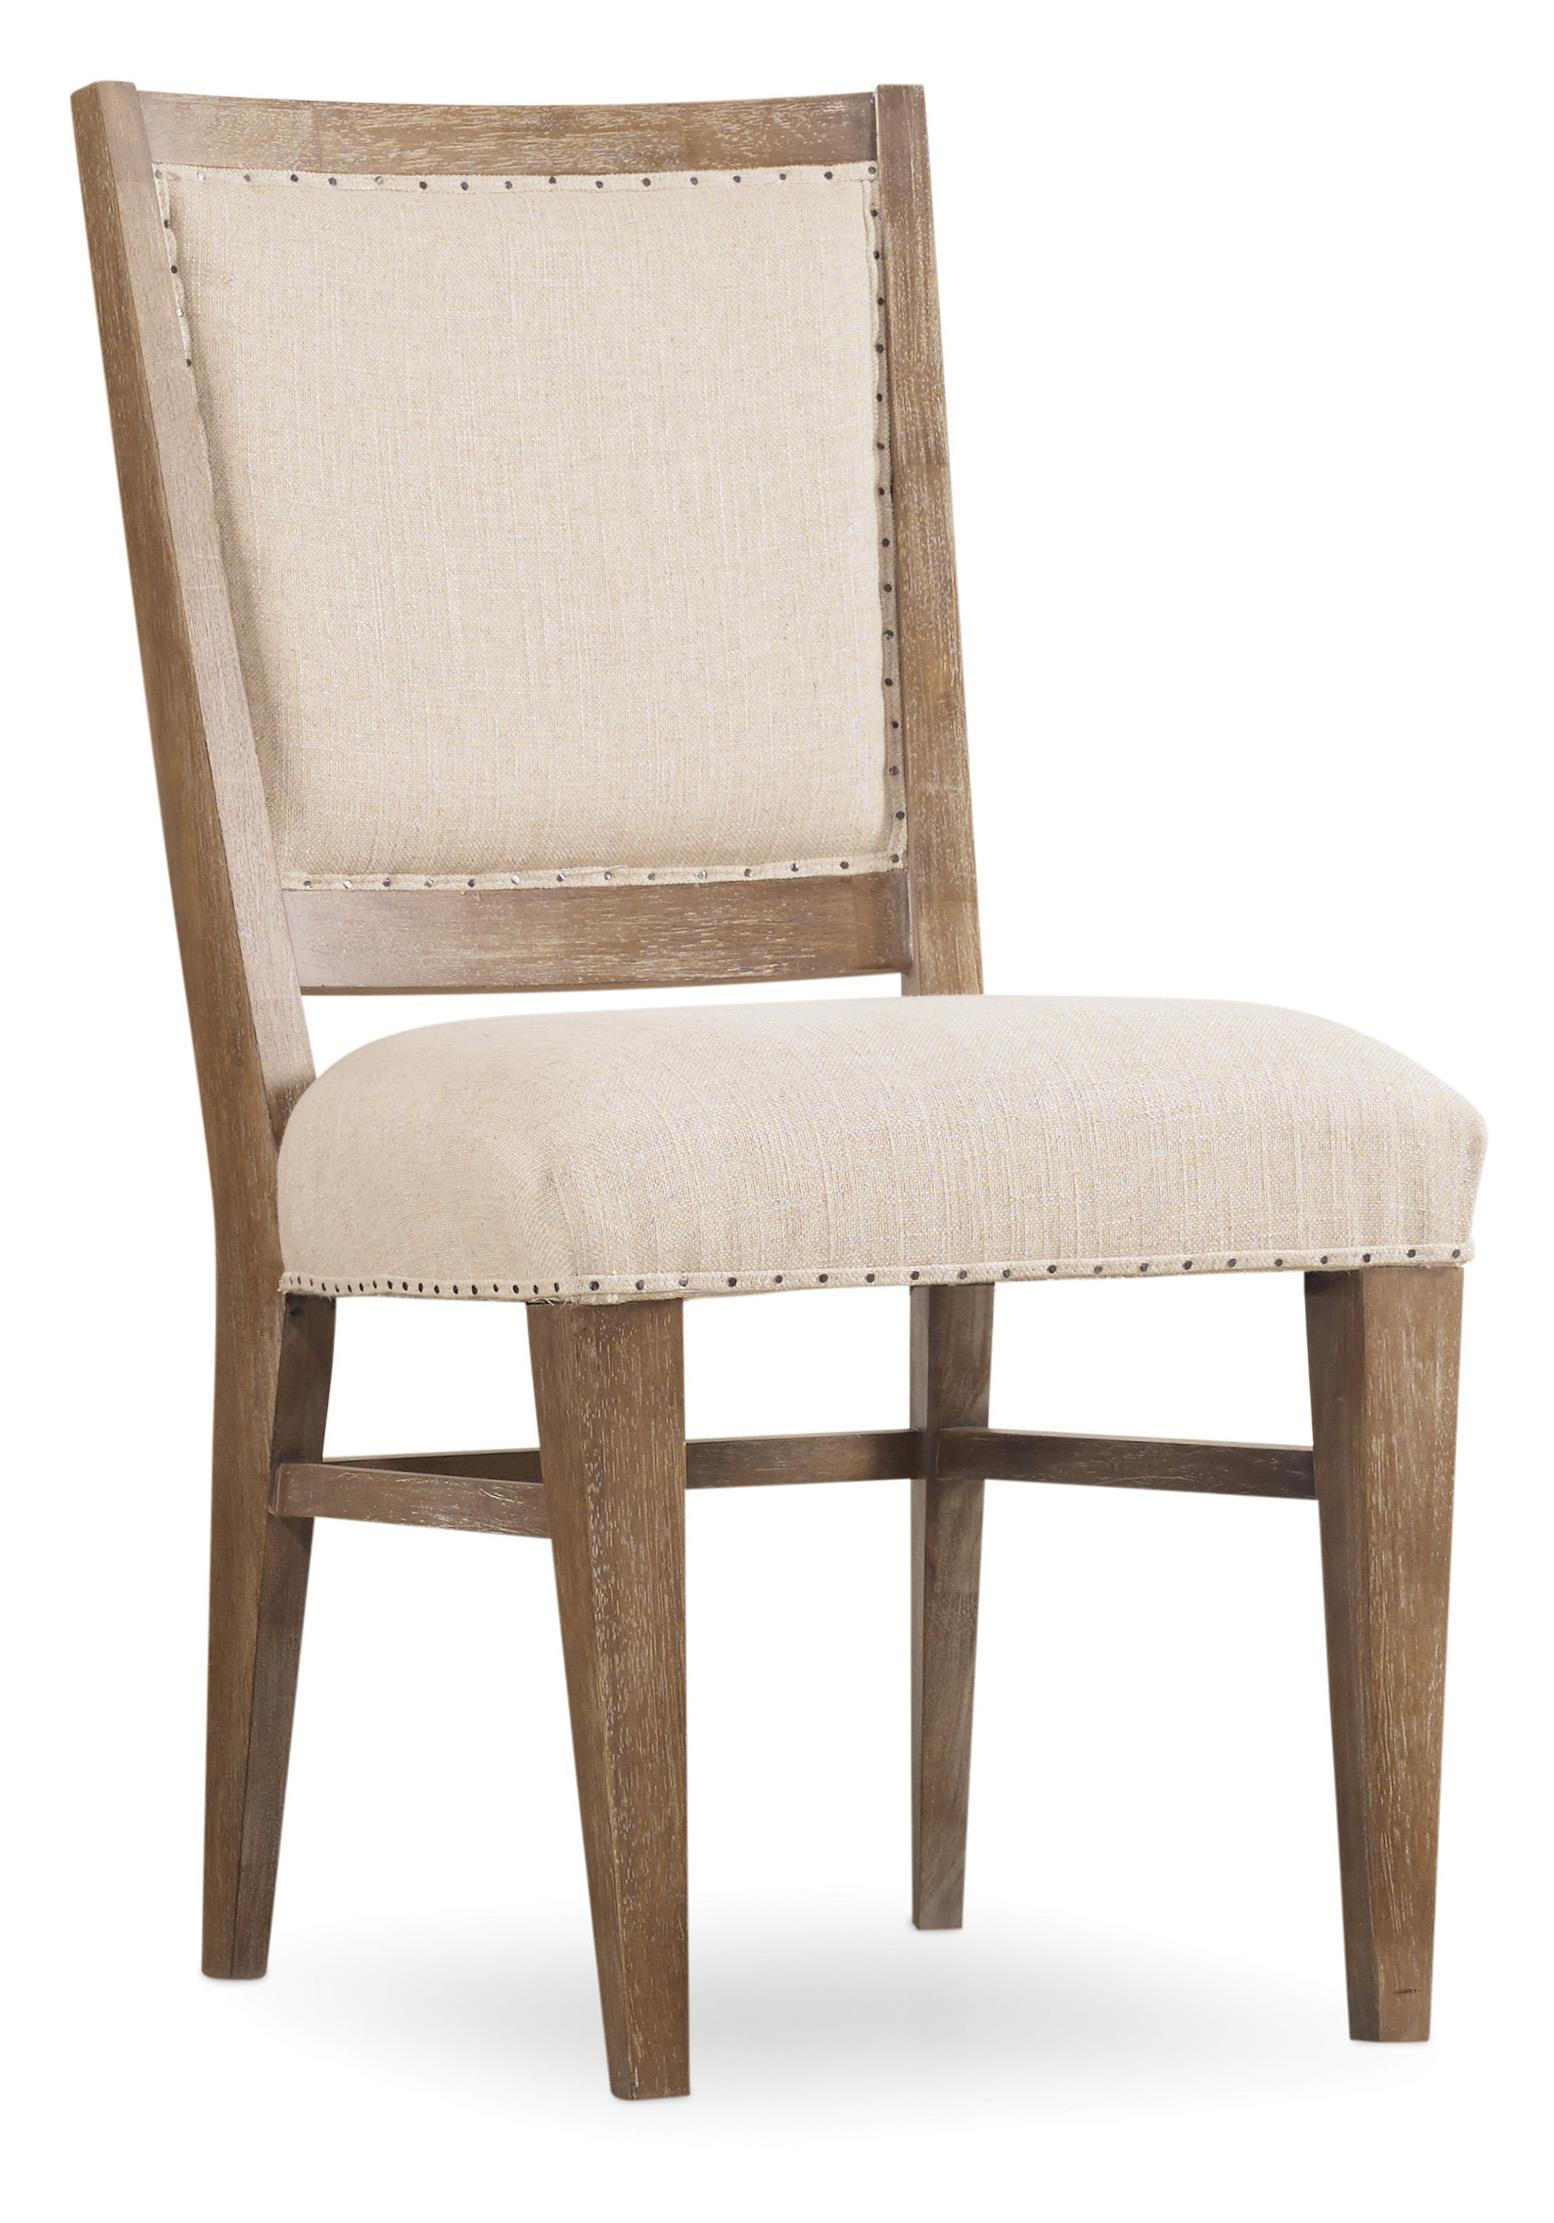 Studio 7H Stol Upholstered Side Chair by Hooker Furniture at Baer's Furniture